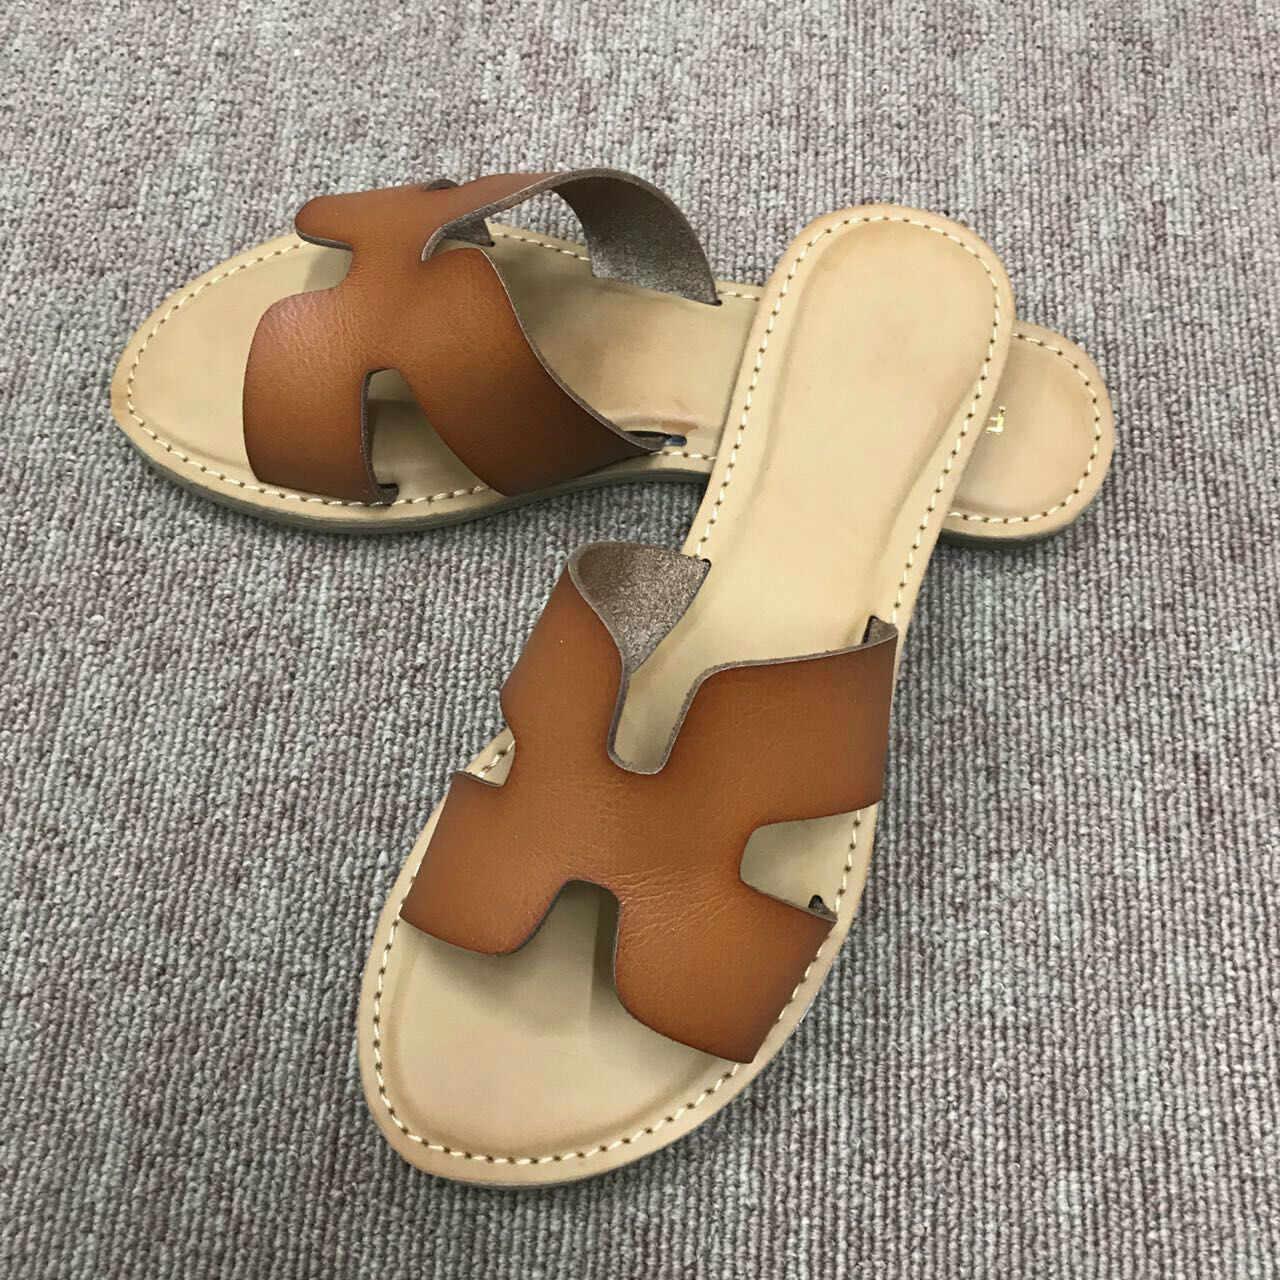 Woman Sandals 2019 Summer New Fashion Slides Womans Slippers Summer Flats  Outdoor Shoes Women Beach Shoes d53e66d8e67c